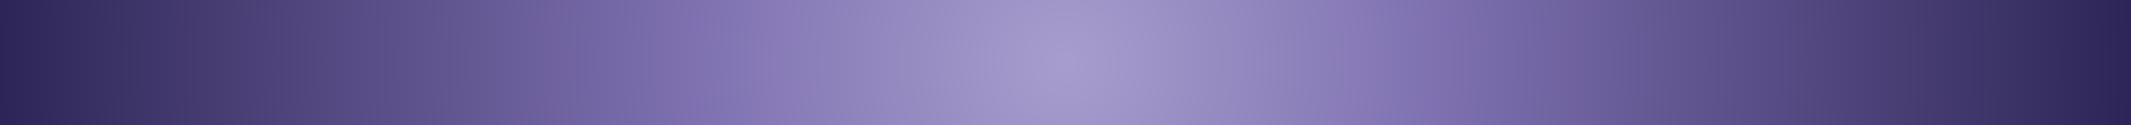 grad-purple